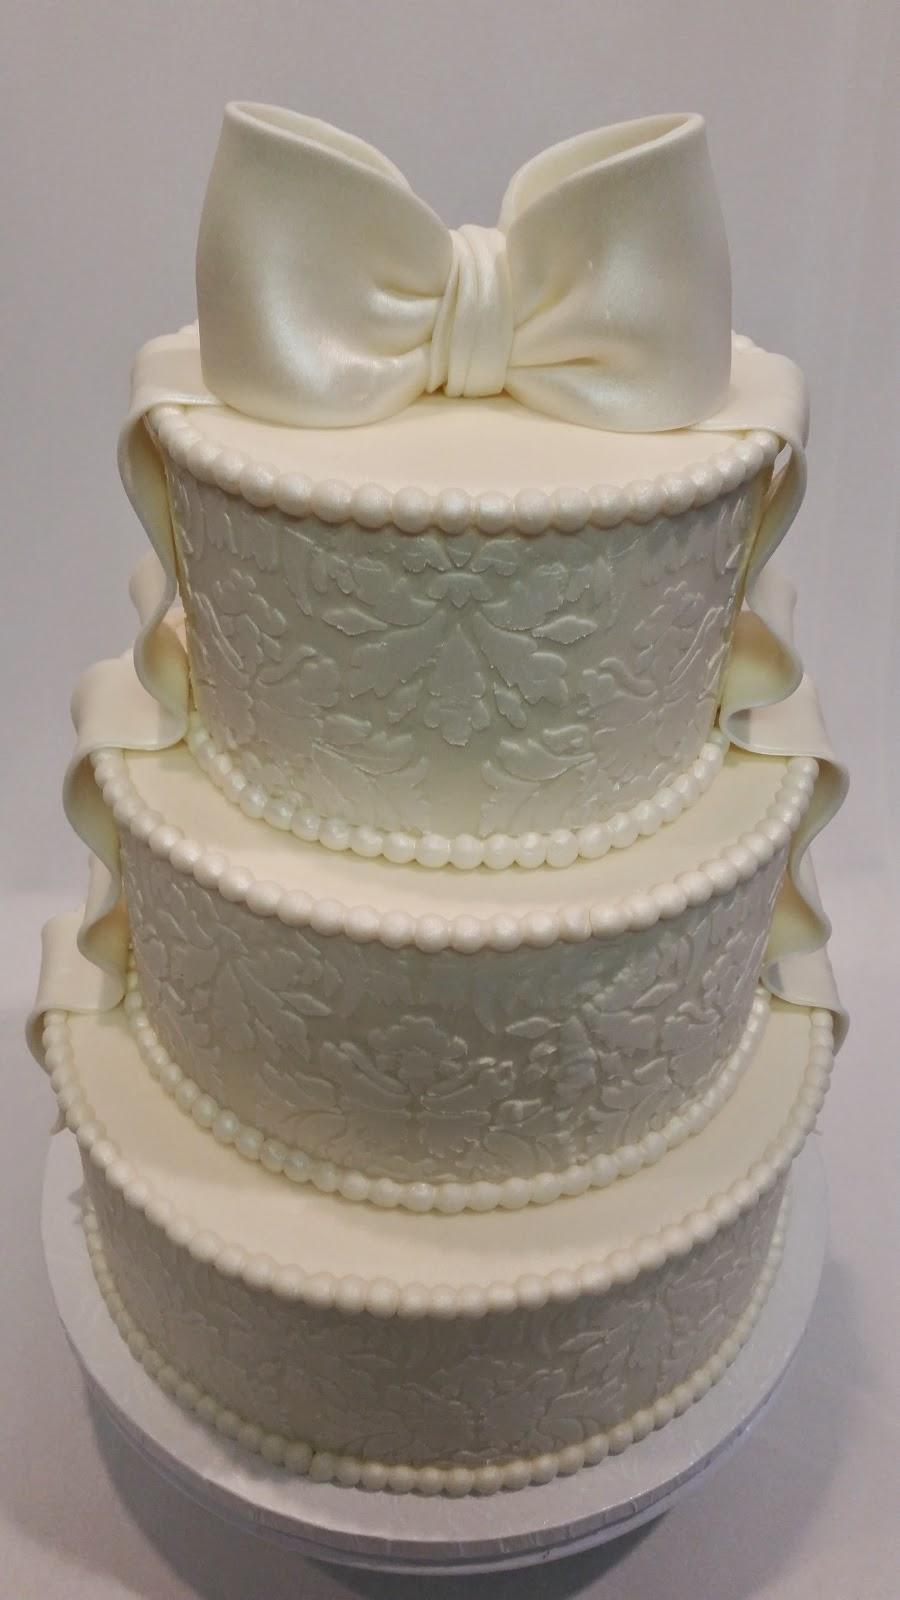 MyMoniCakes 3 Tiered Ivory Stencil Wedding Cake